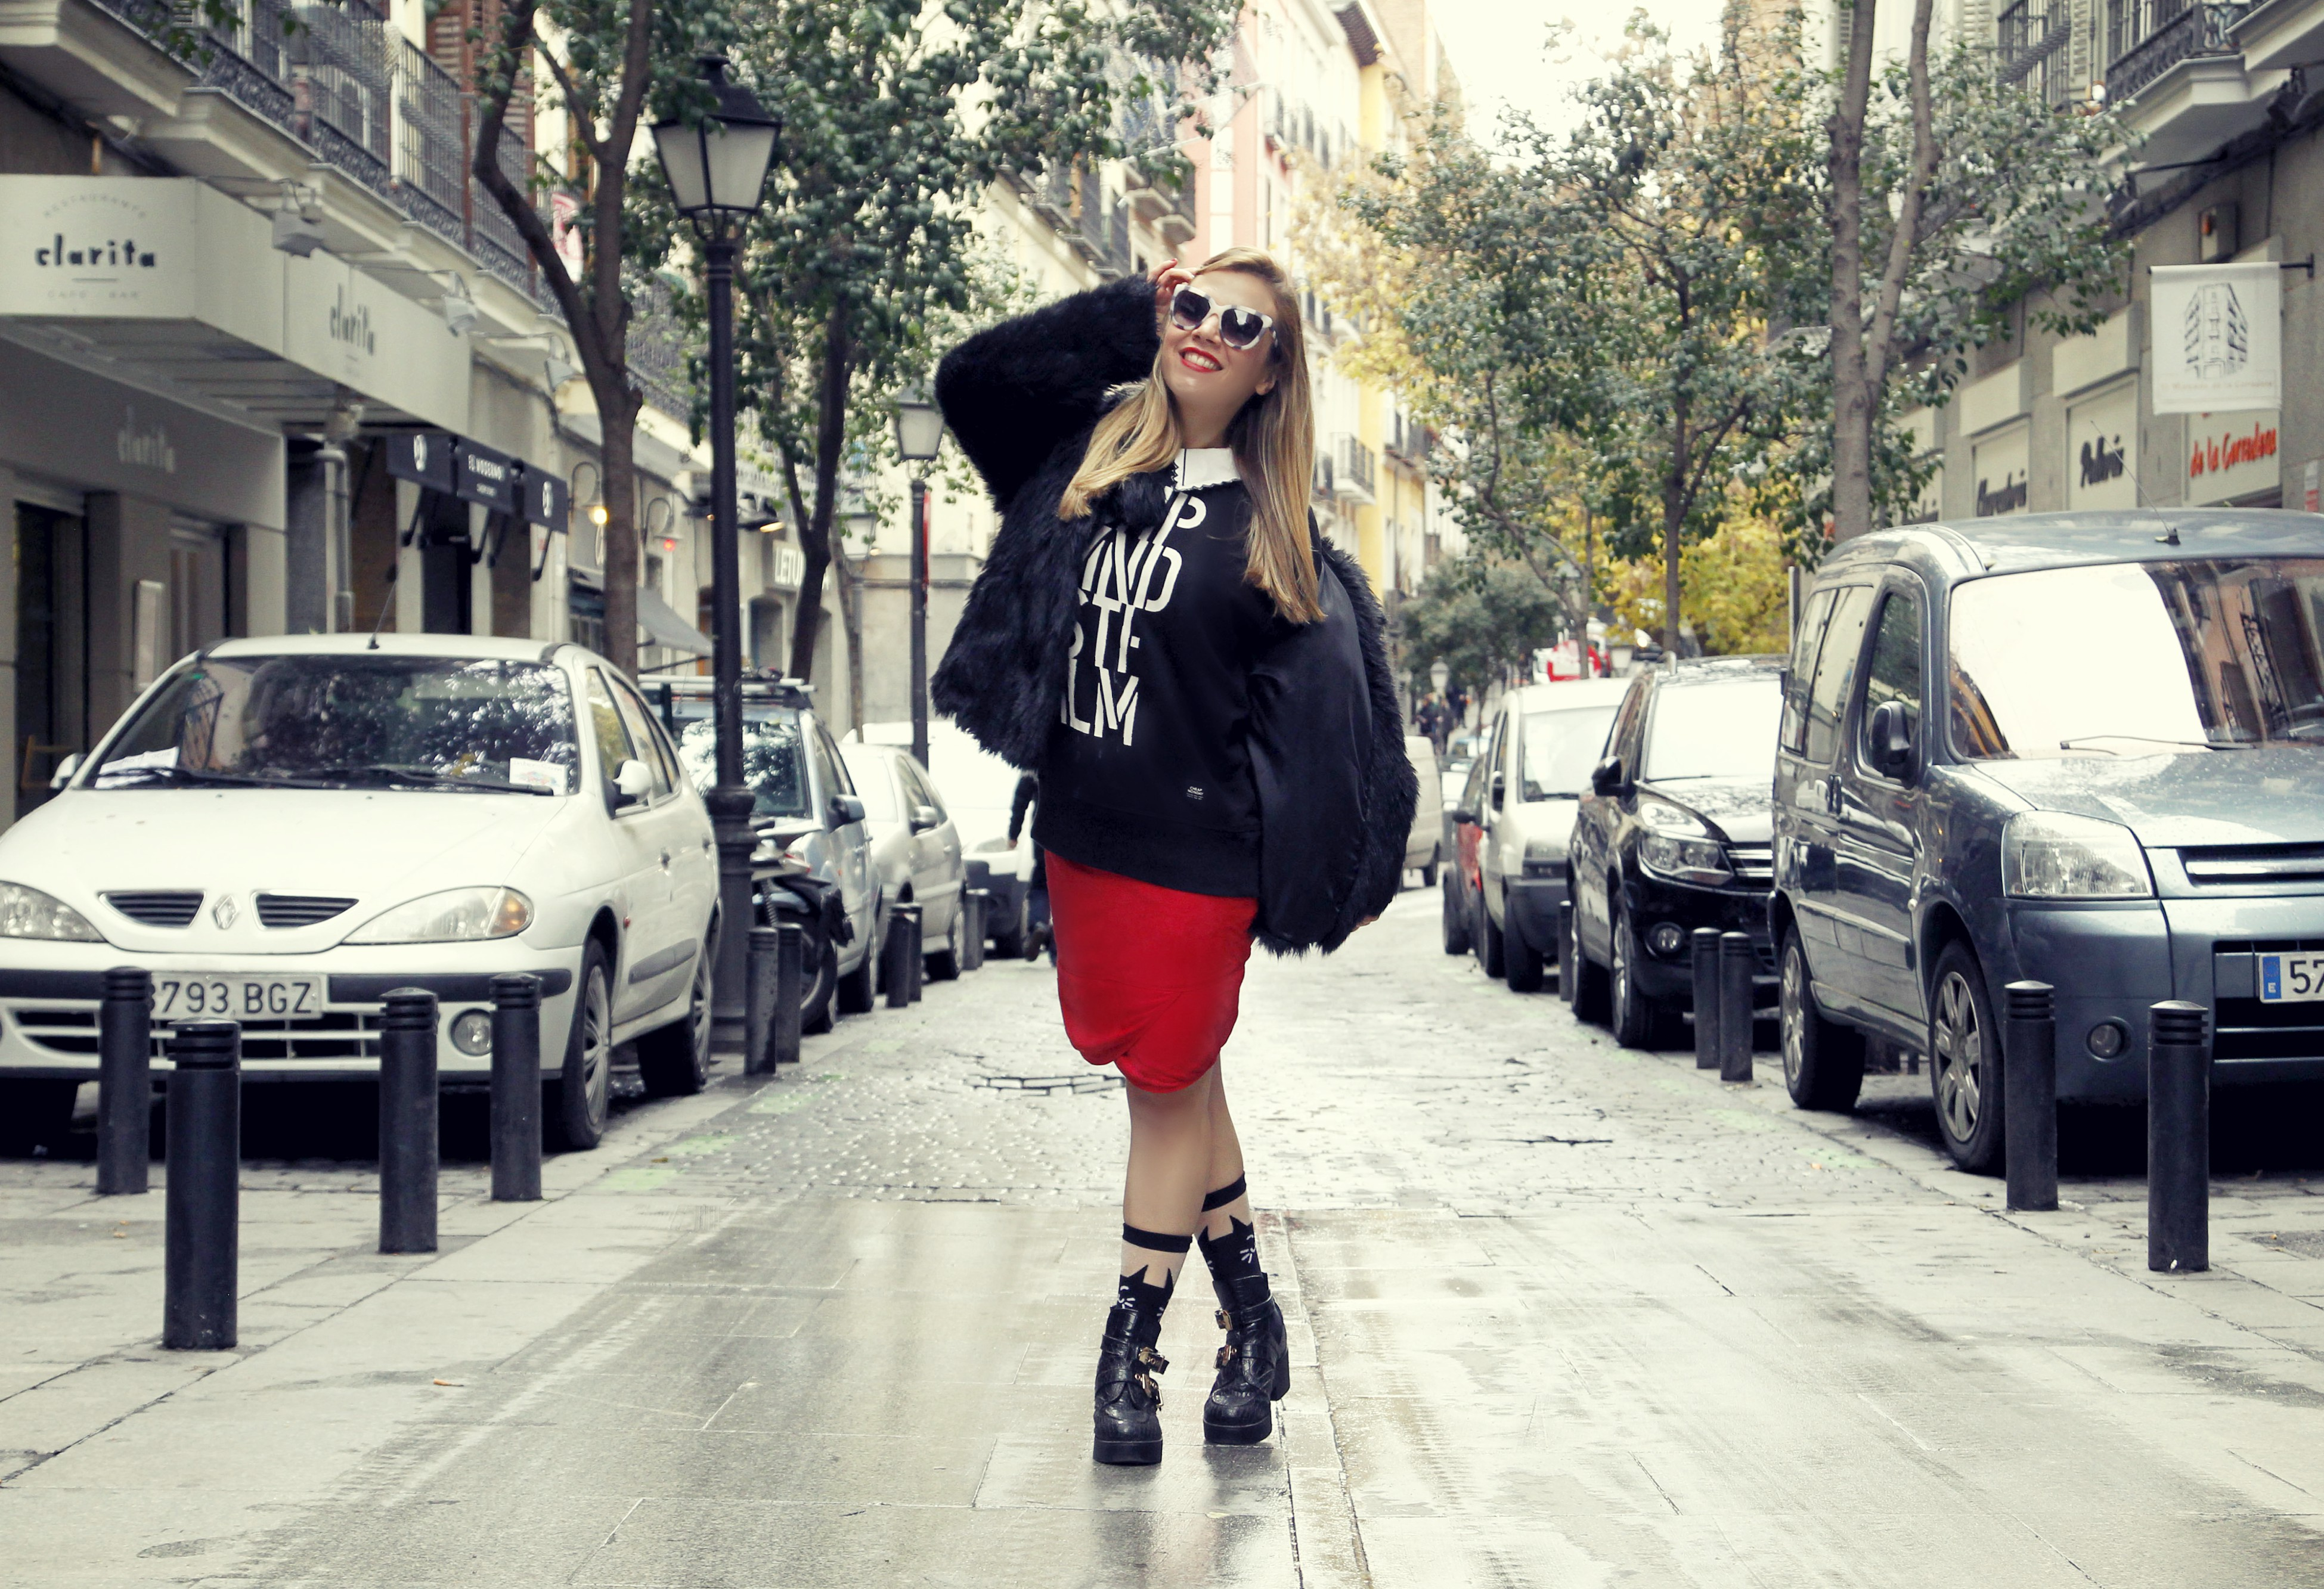 Malasana-street-style-neubau-eyewear-ChicAdicta-blog-de-moda-Chic-Adicta-look-rojo-gafas-de-sol-PiensaenChic-Piensa-en-Chic